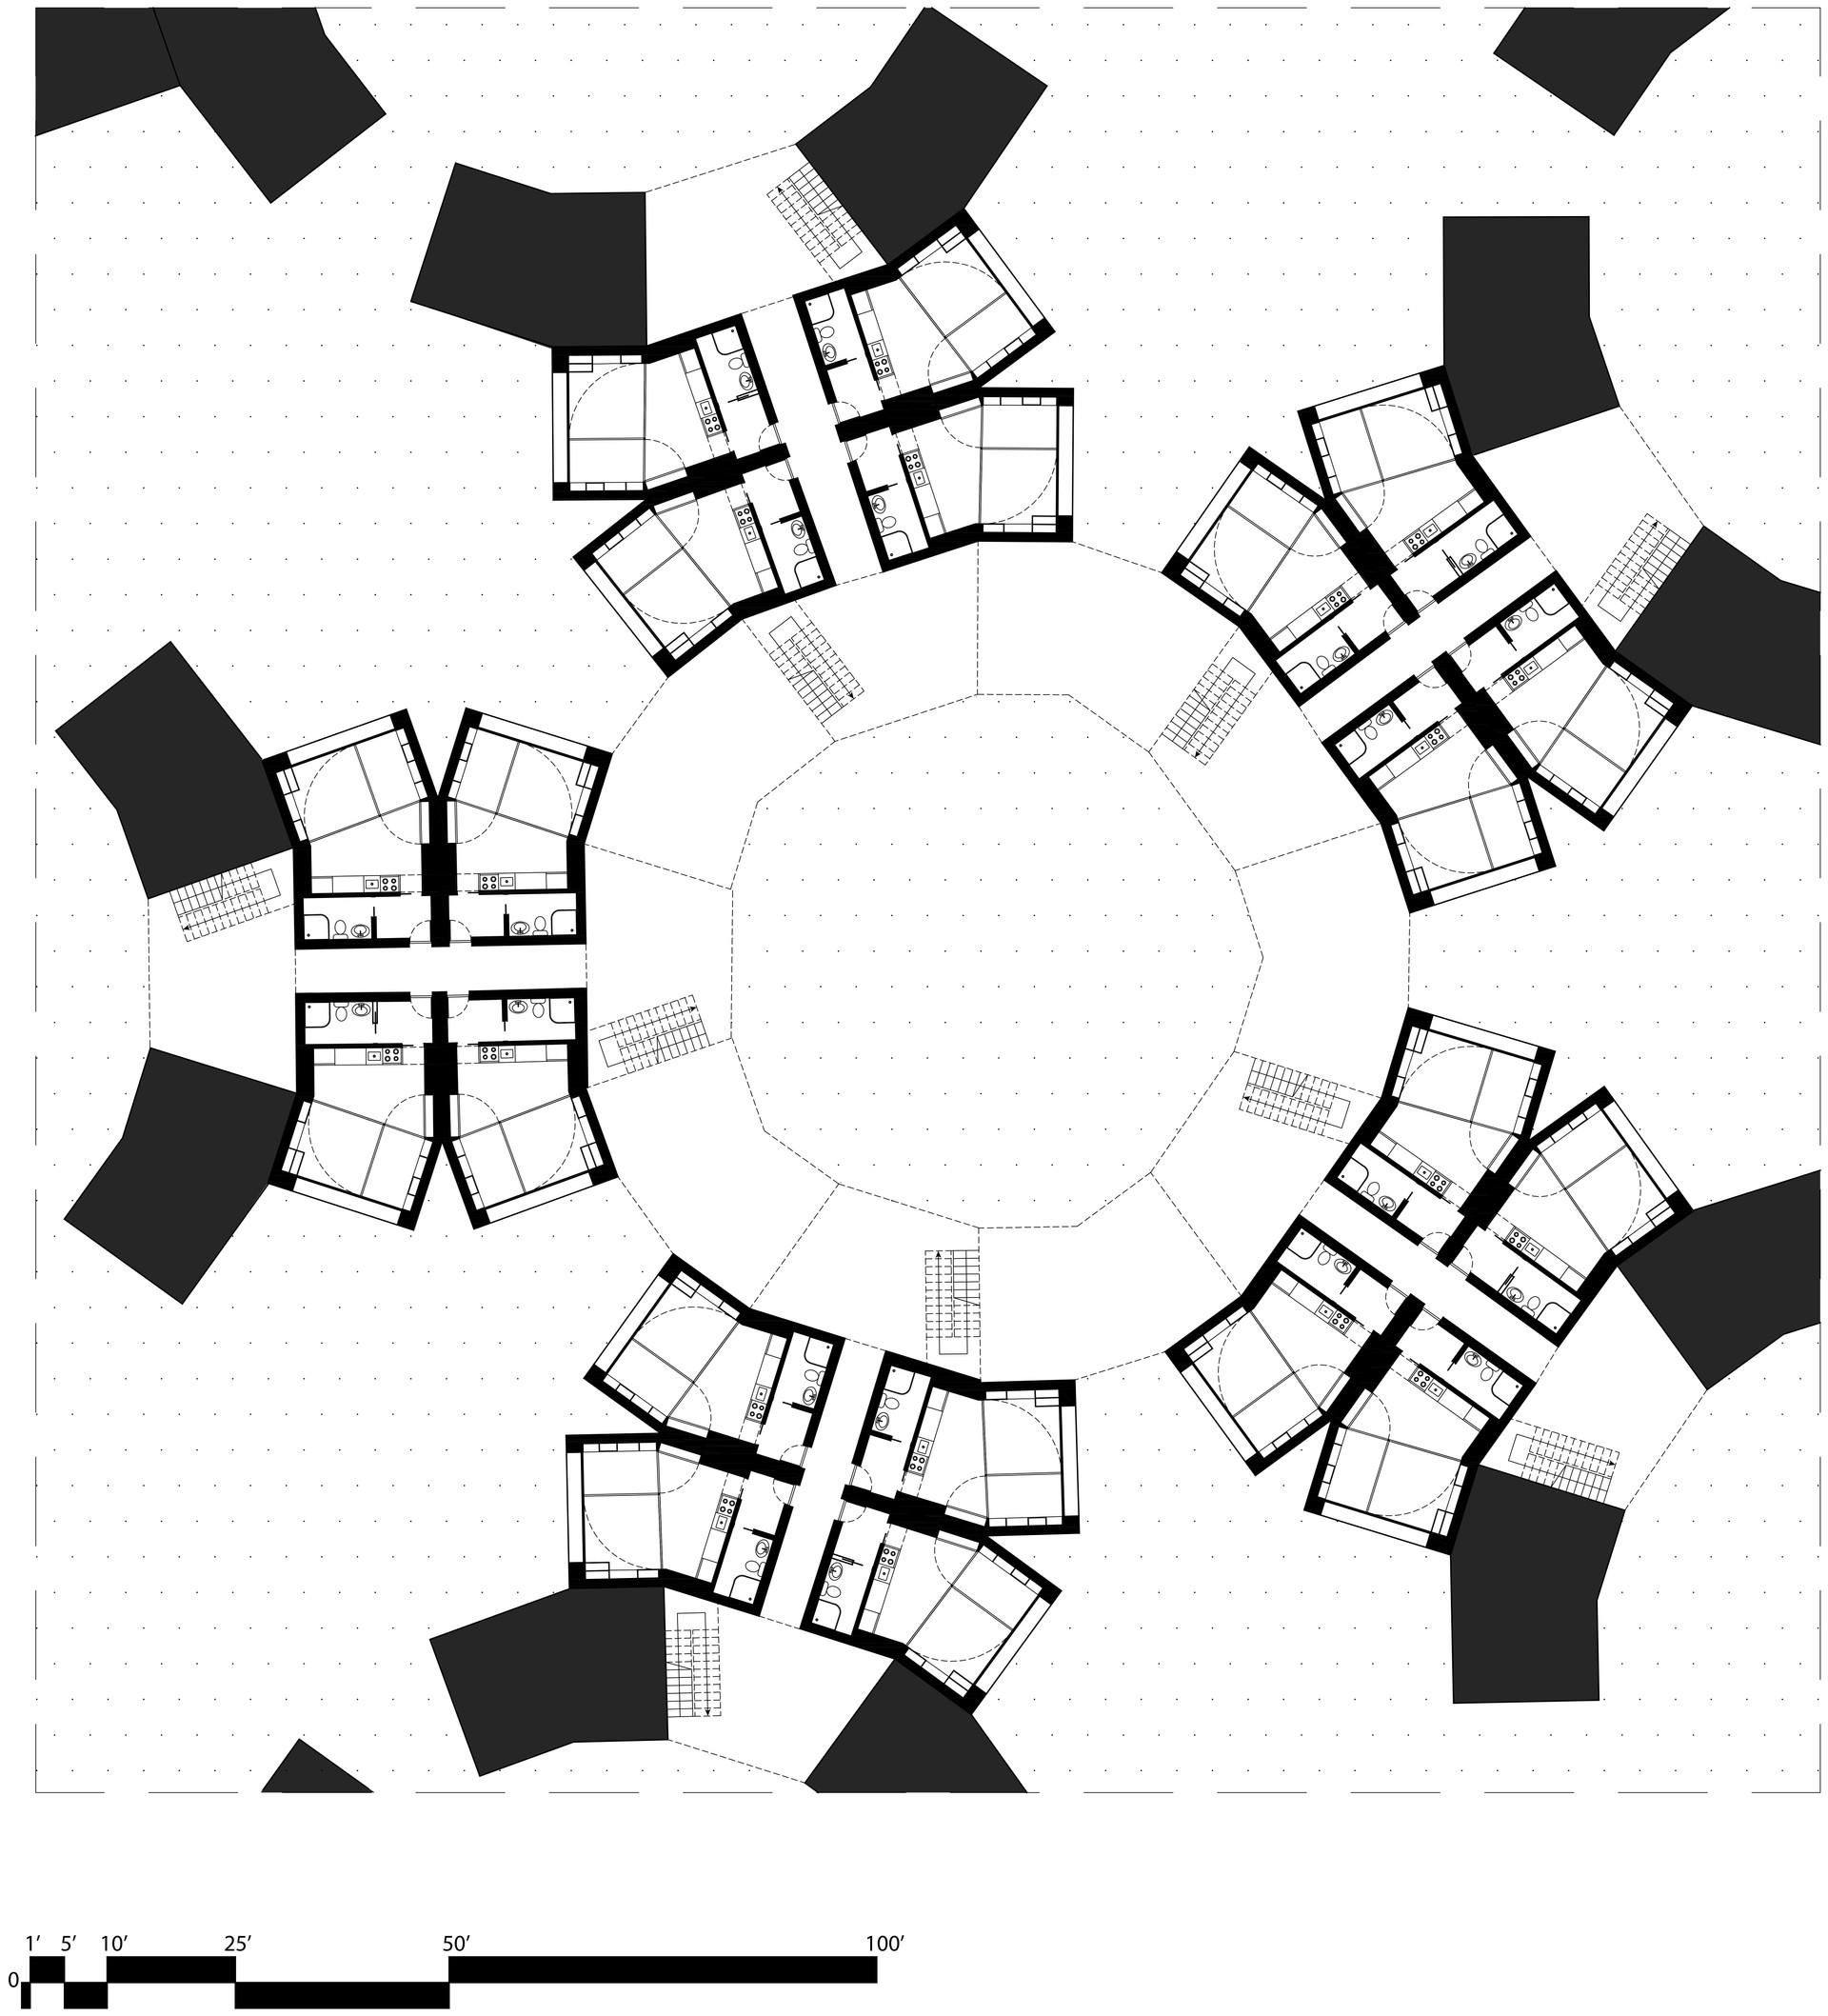 FloorPlan1_AntonioLeung.jpg